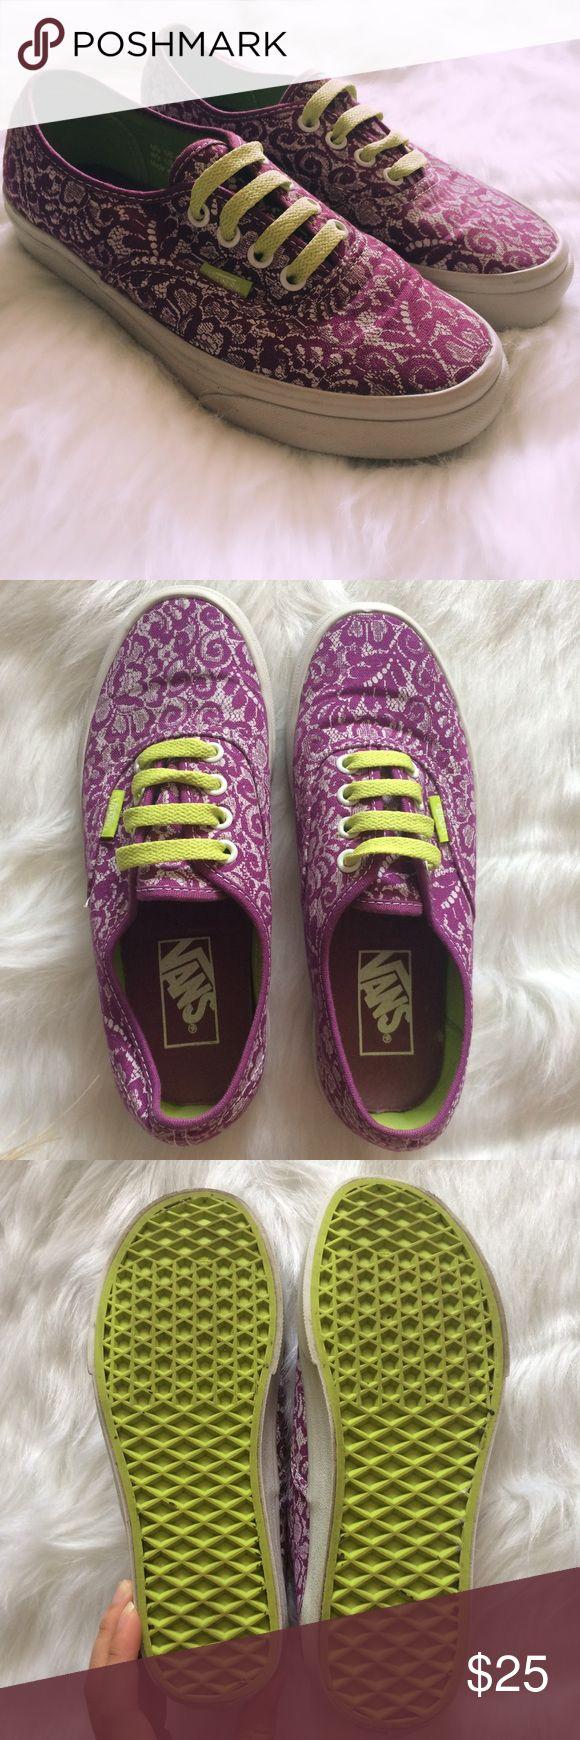 CUSTOM VANS Men's 4 Women's 5.5 Purple printed vans with green-yellow shoelaces. Men's size 4 Women's size 5. Preowned, good condition. Vans Shoes Sneakers